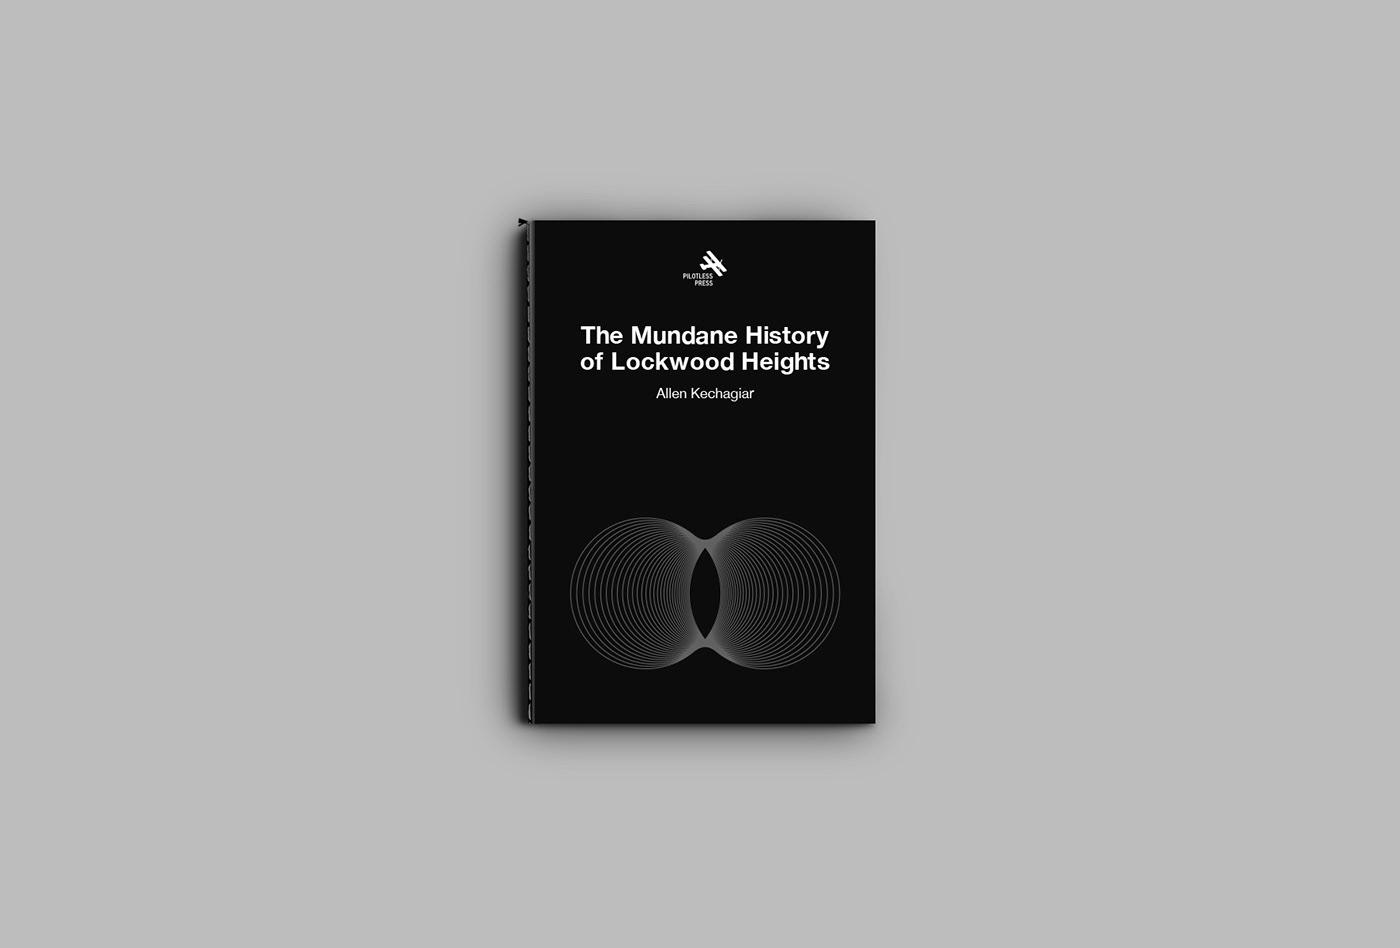 The Mundane History of Lockwood Heights, 1st Edition